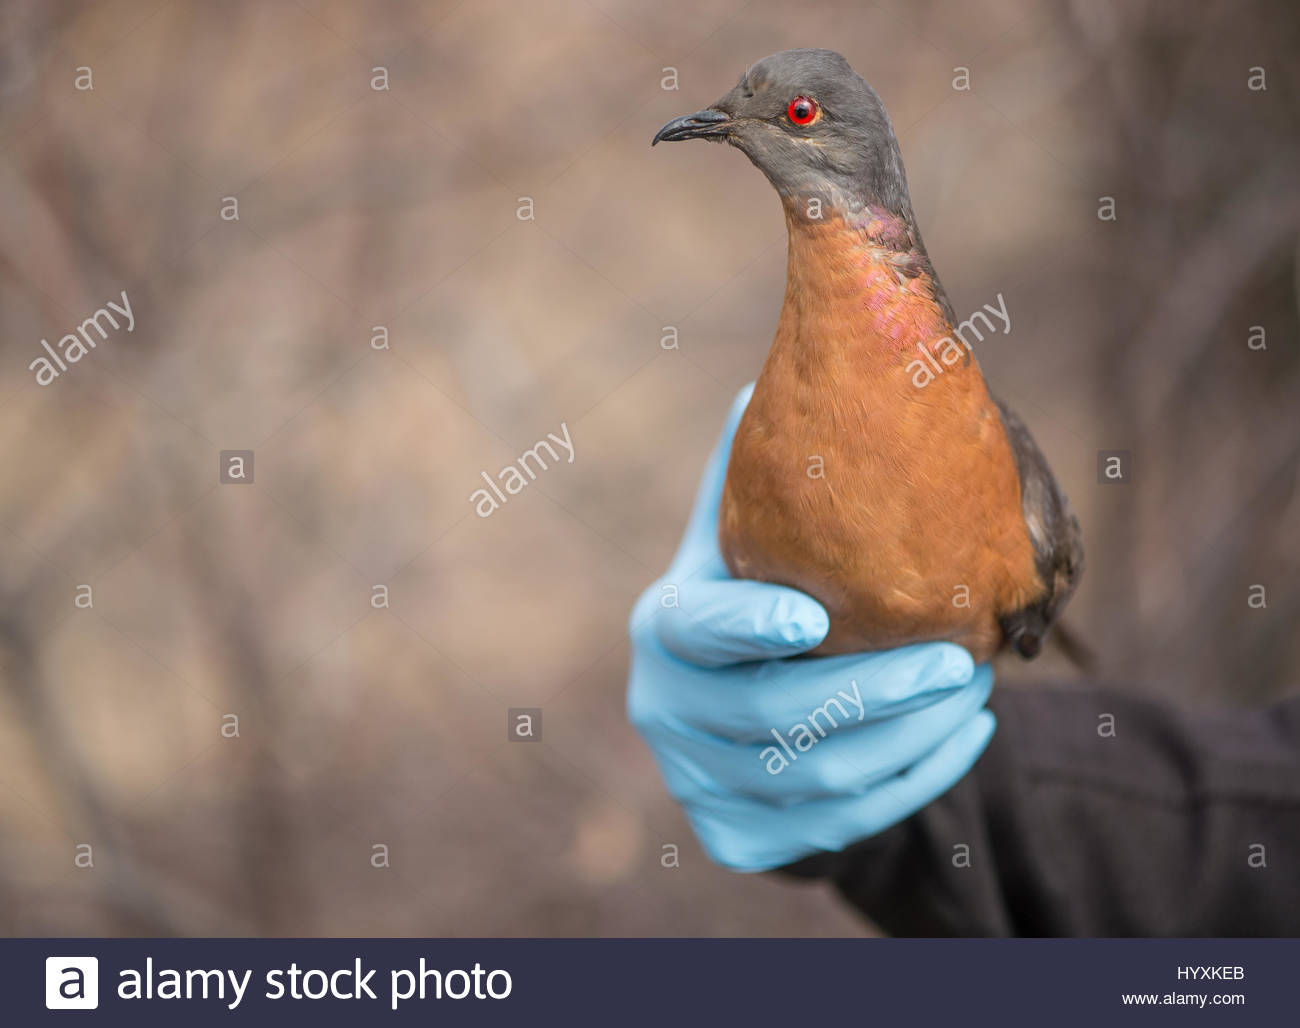 An extinct passenger pigeon, Ectopistes migratorius. - Stock Image